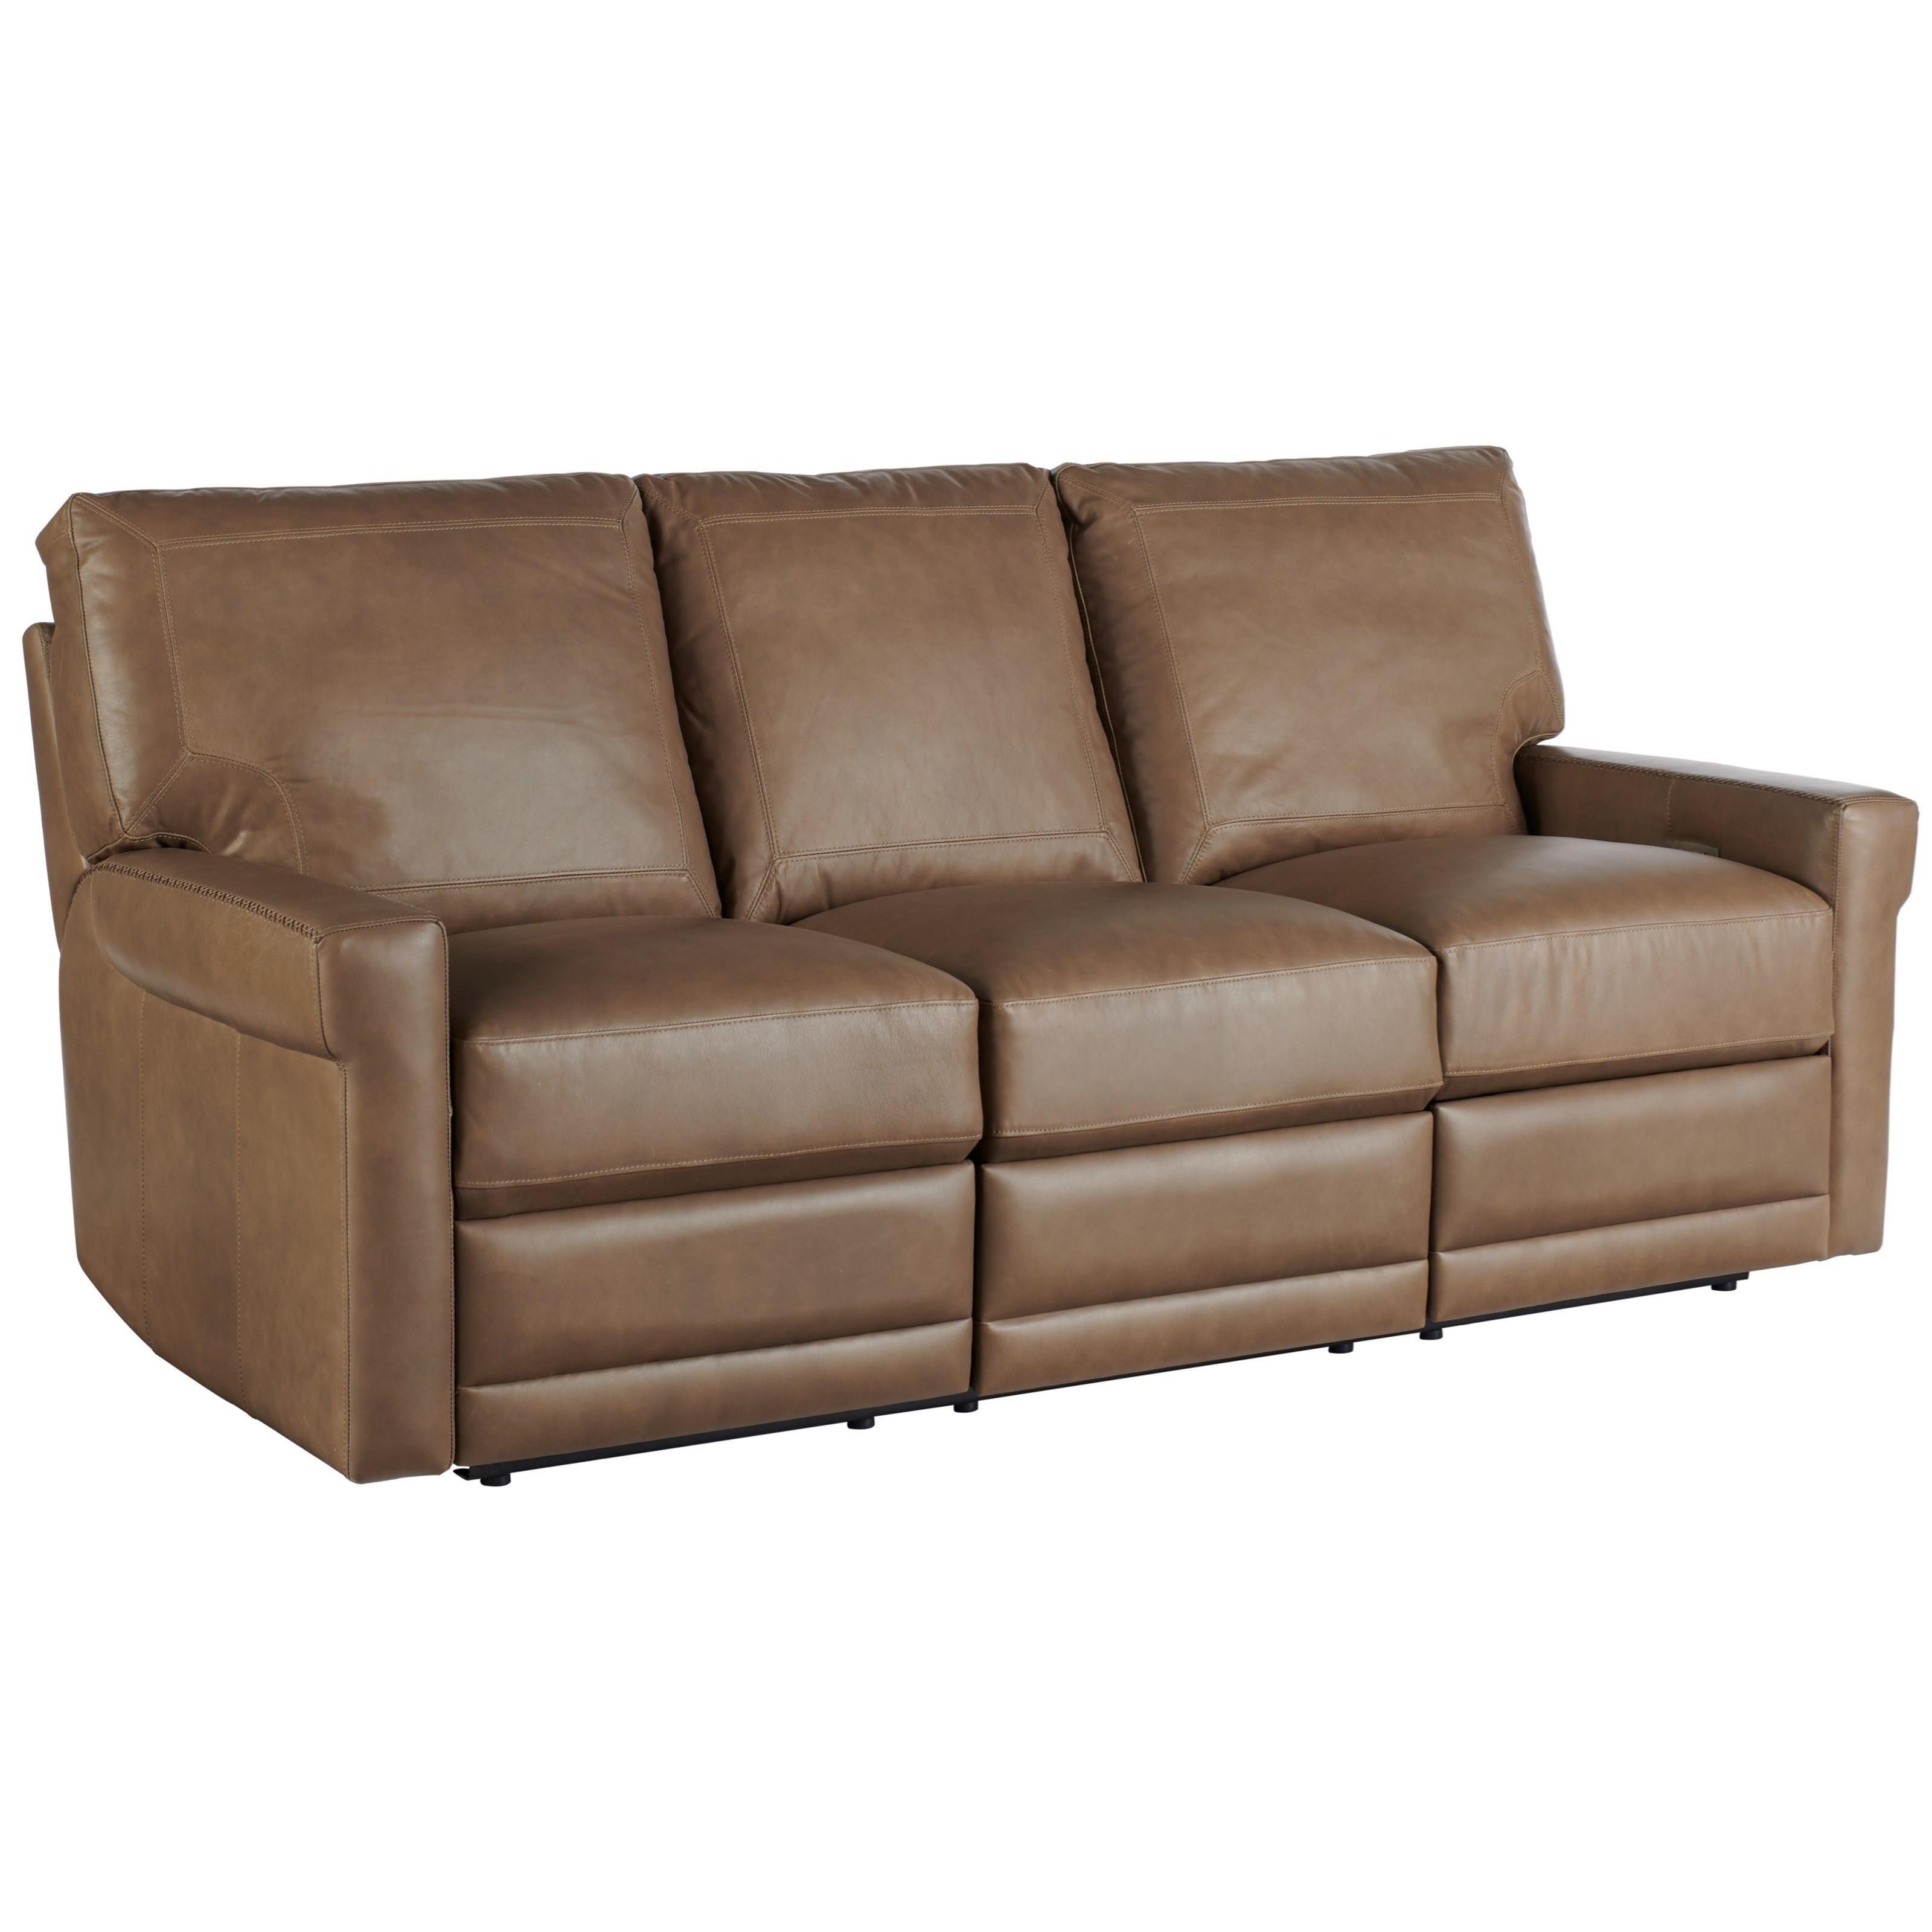 Motion Olsen Motion Sofa by Universal at Baer's Furniture